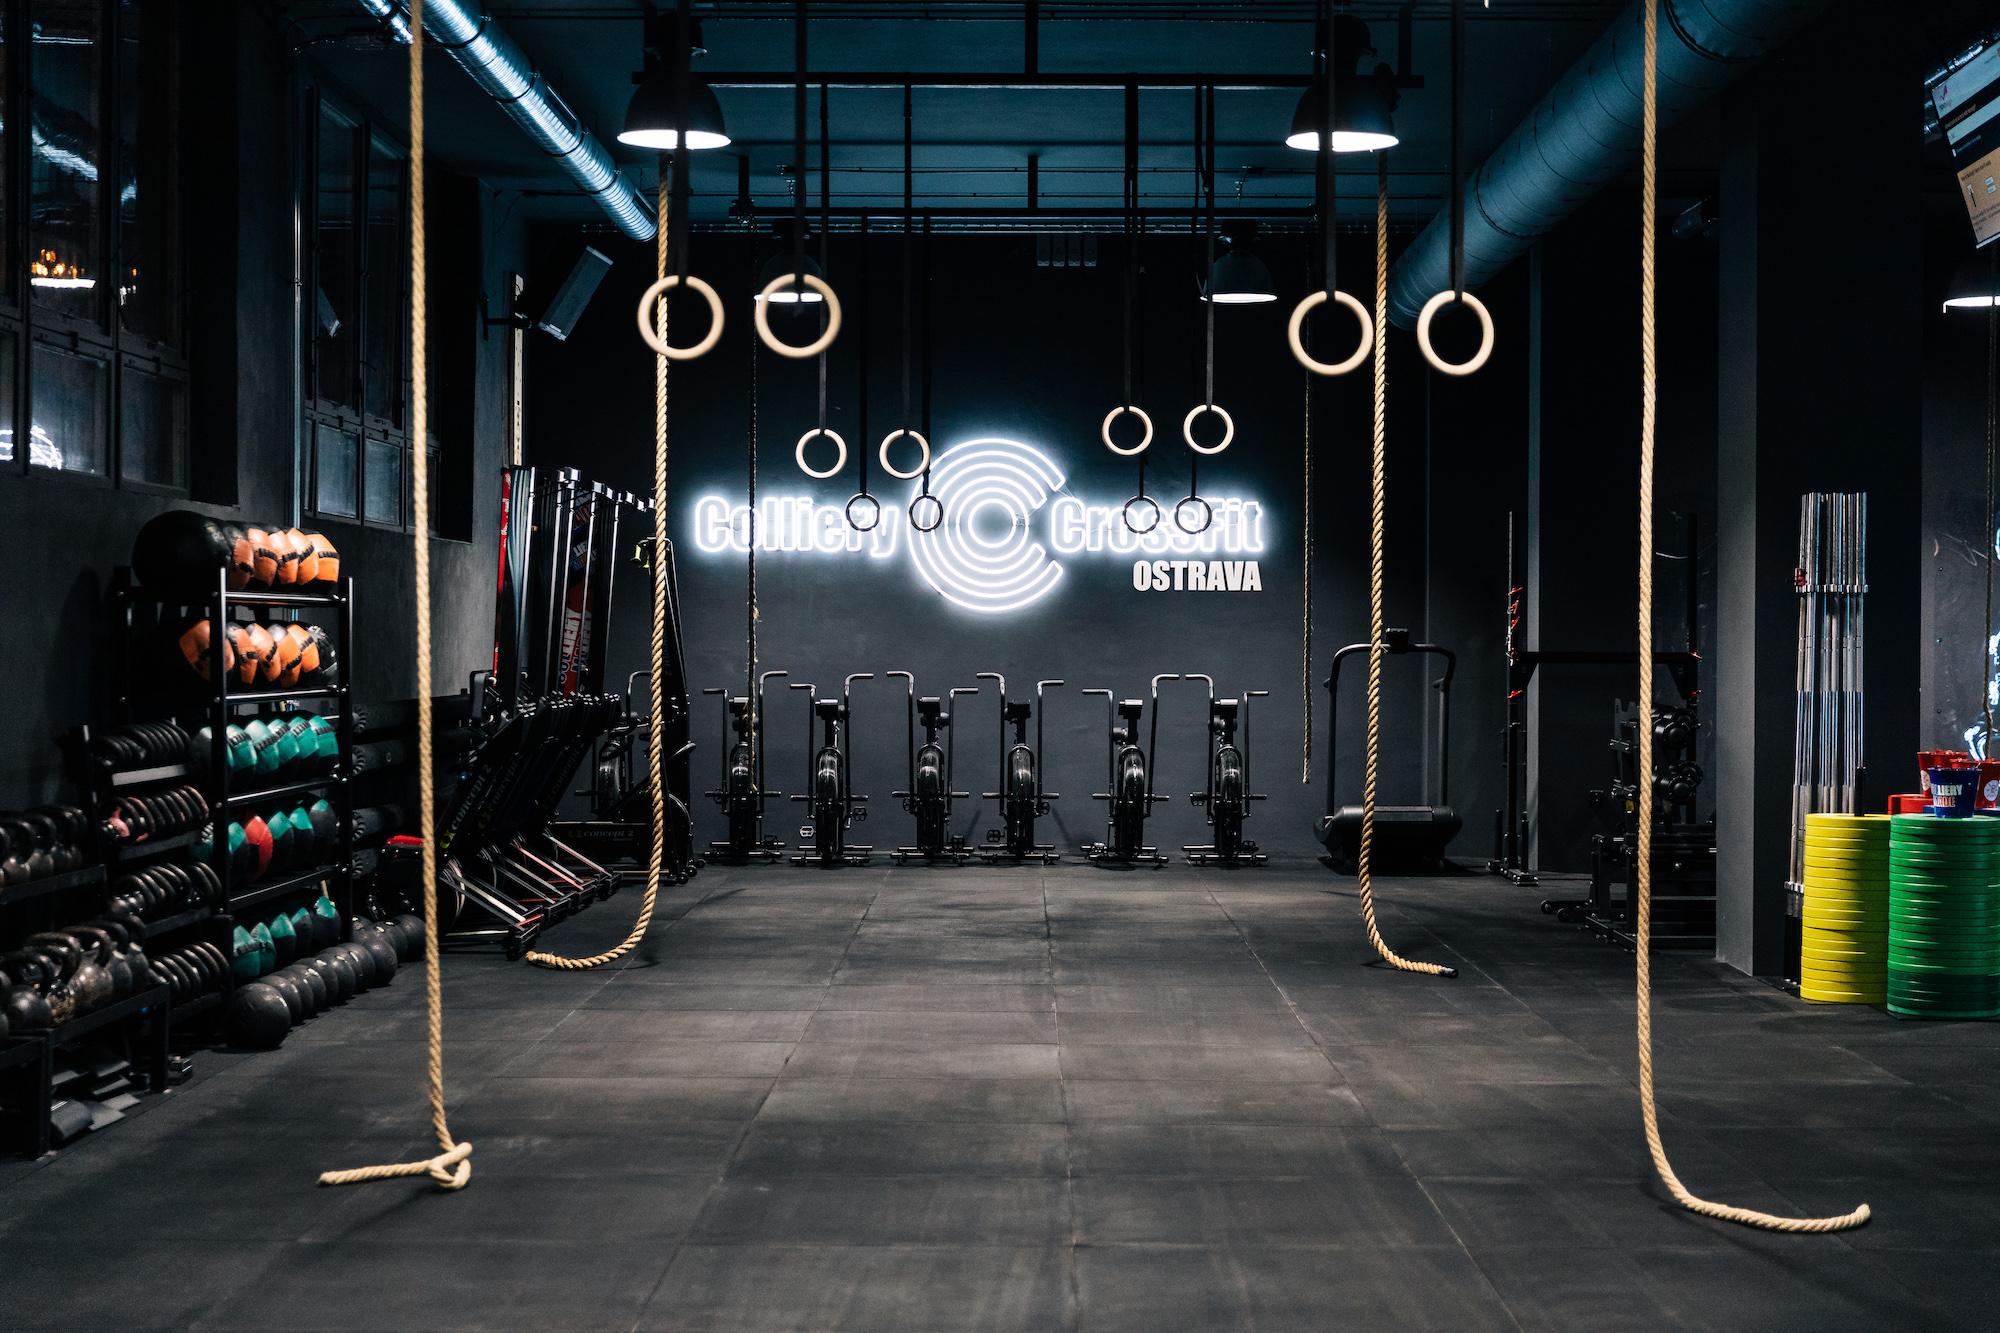 colliery_gym_ostrava_opava_cr_olomouc_crossfit_fitness_cviceni